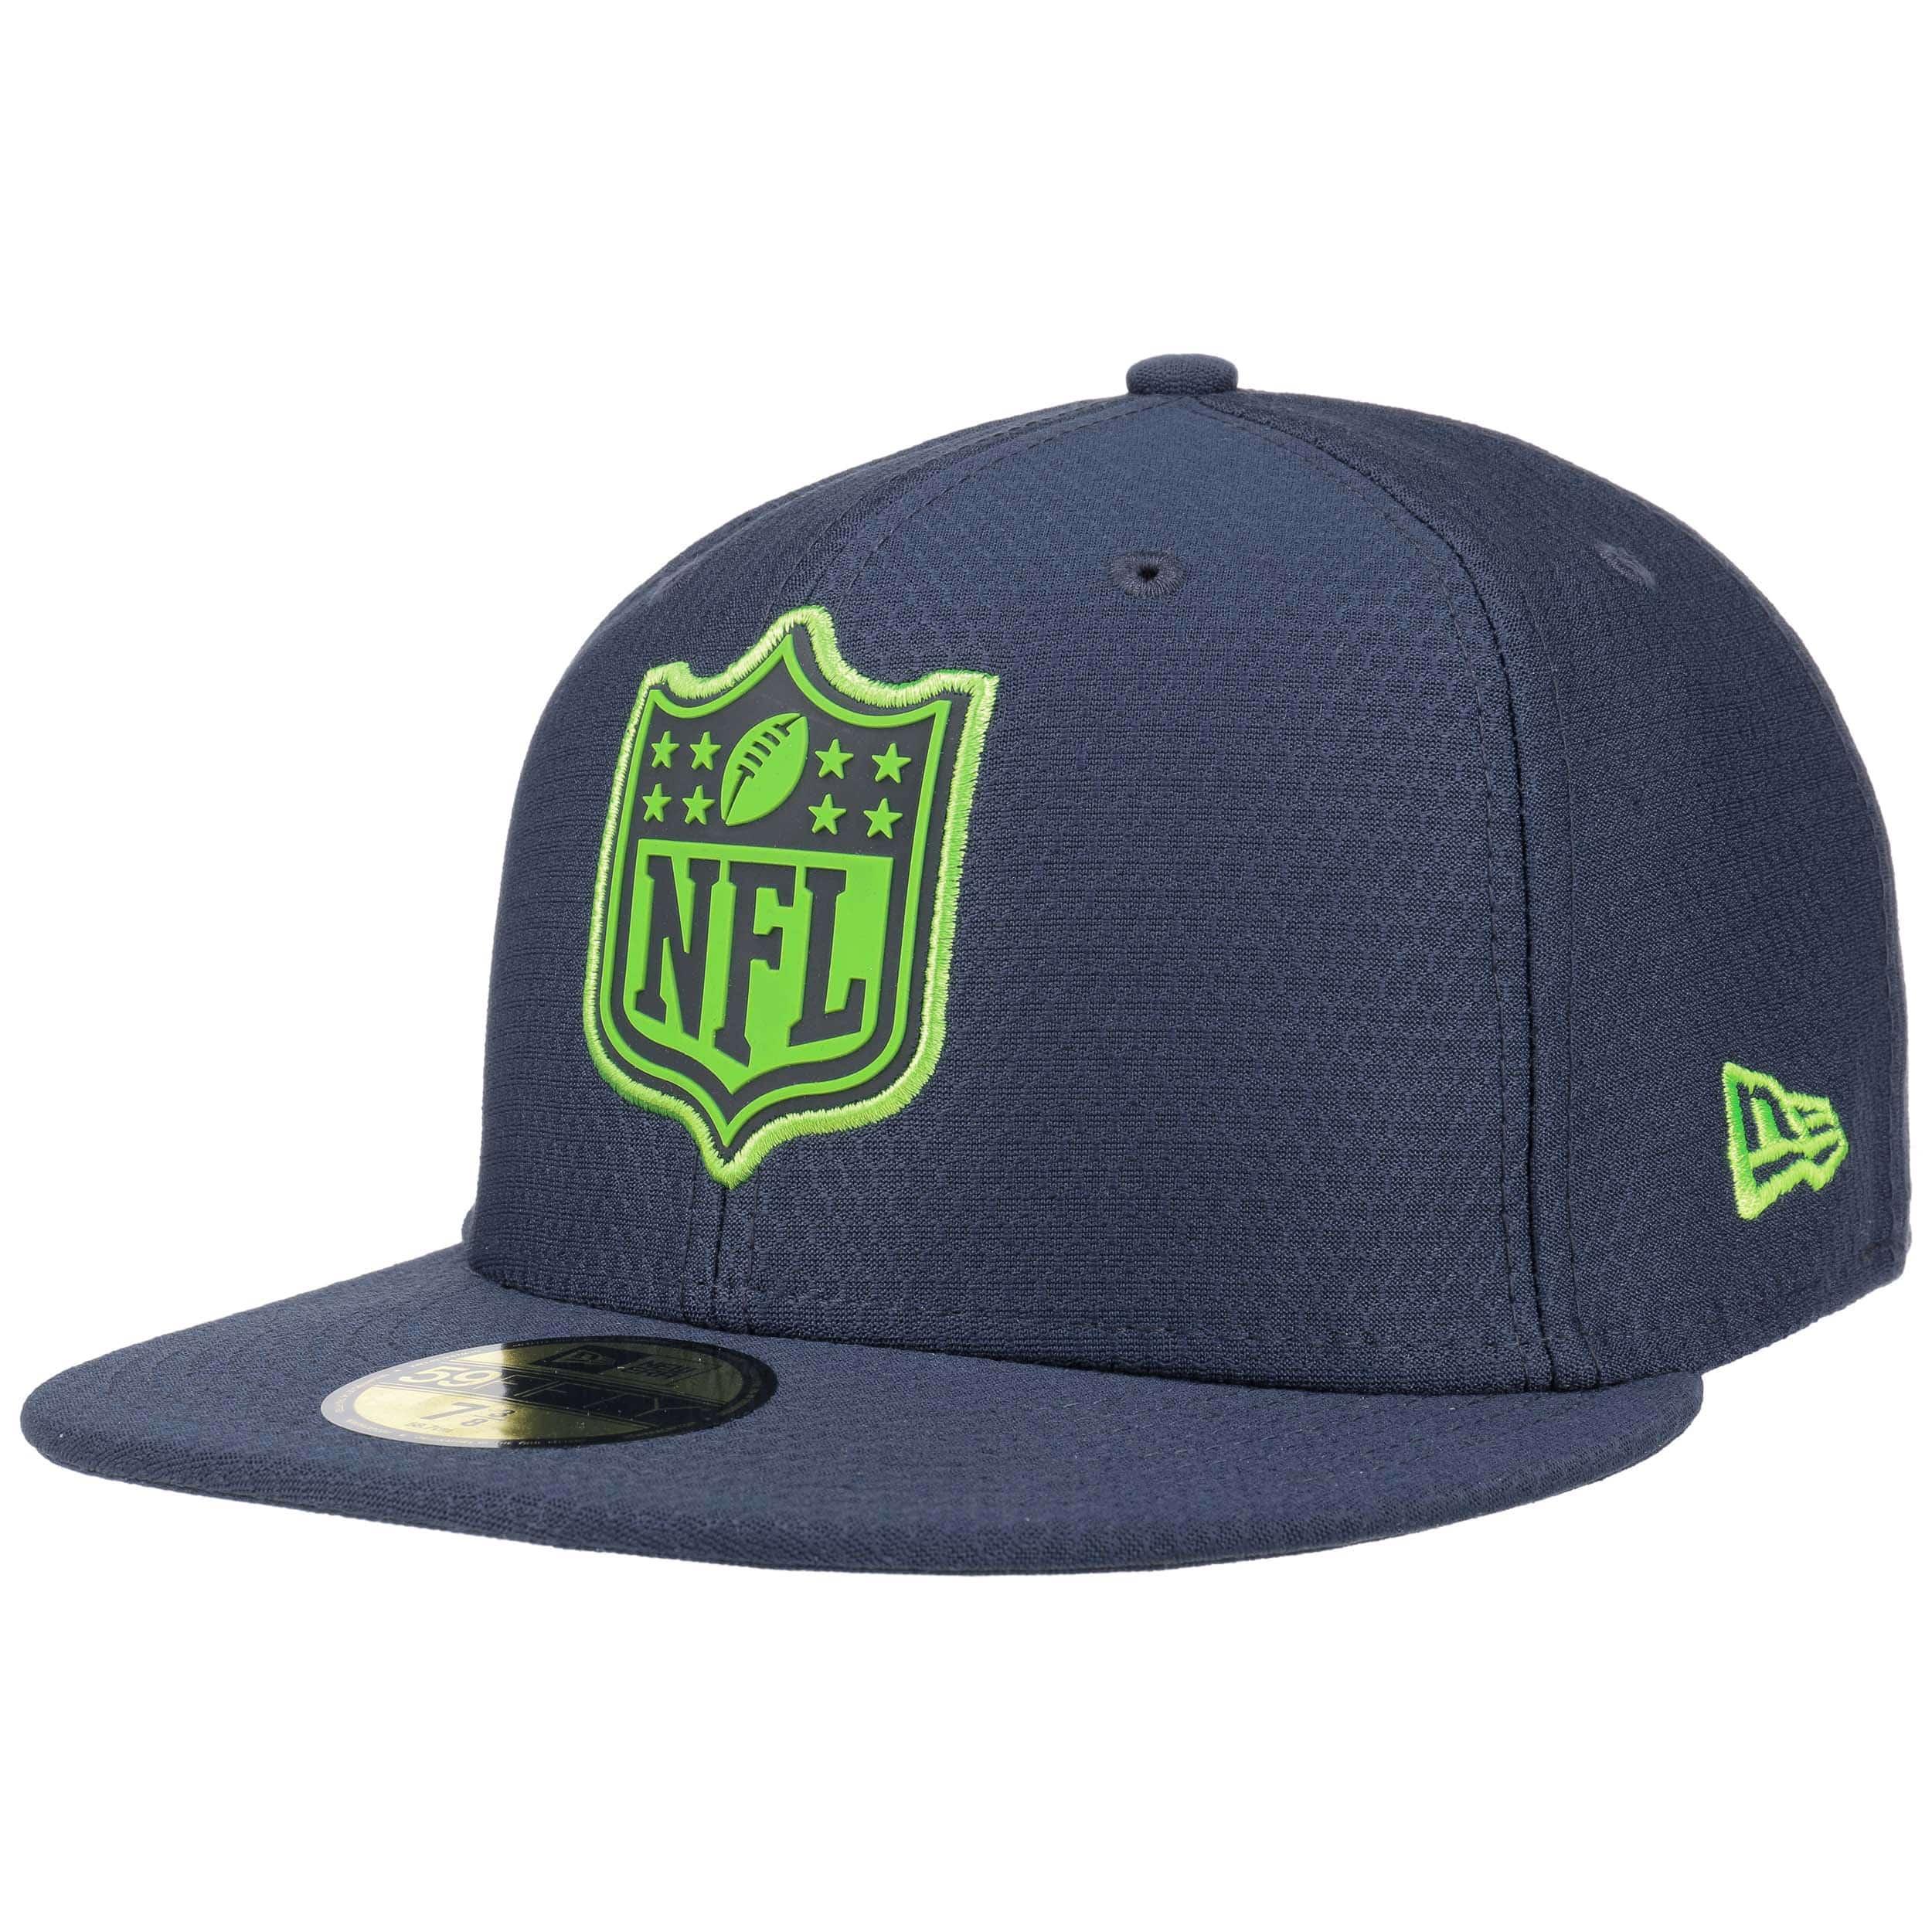 59Fifty League Logo Seahawks Cap. by New Era 6f29274ba